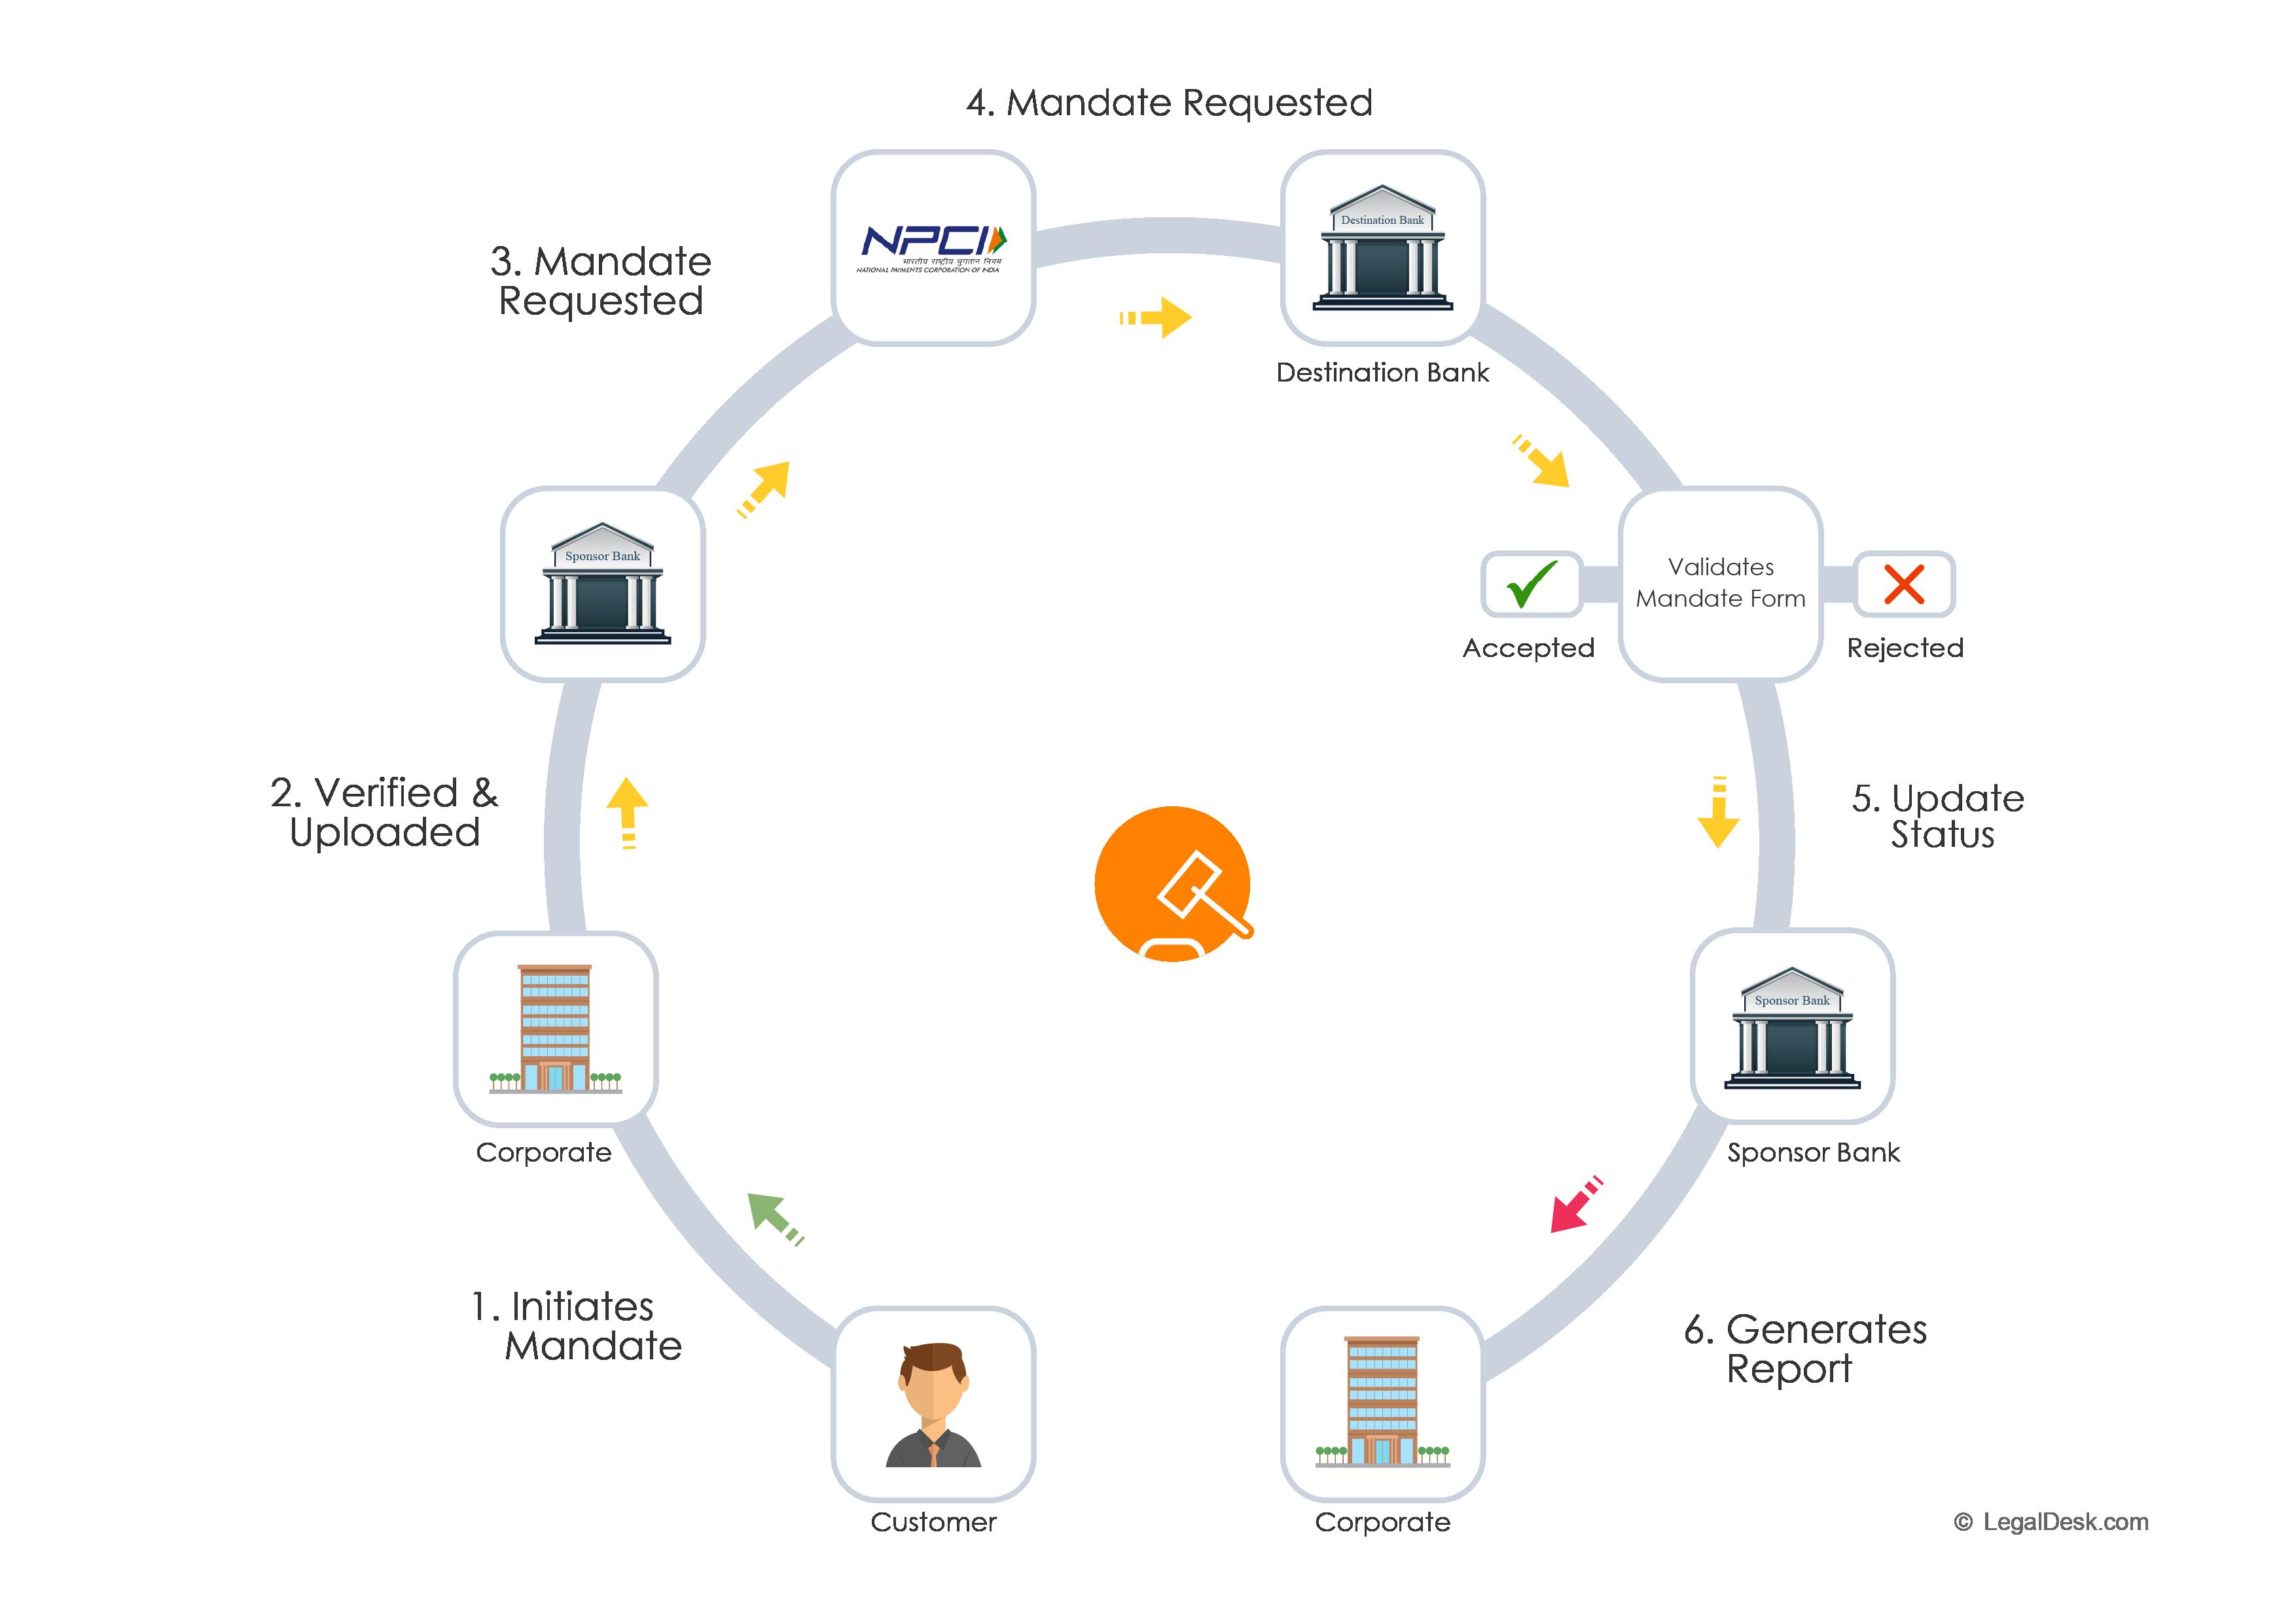 eMandate workflow